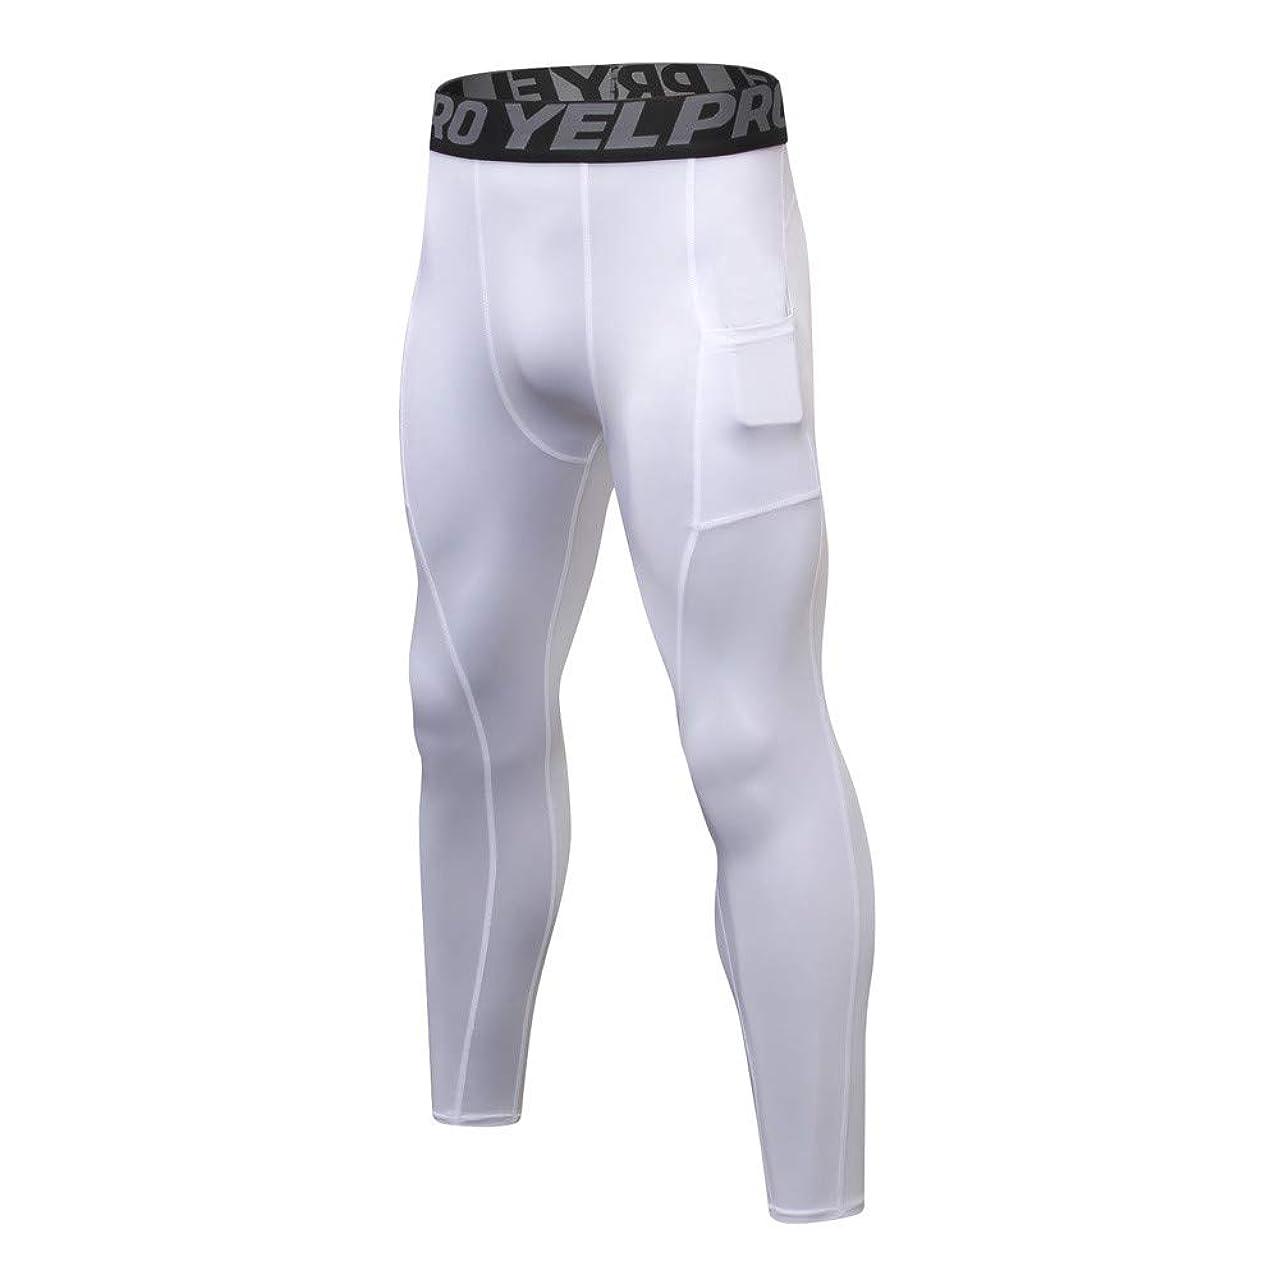 YUTAO Men's Compression Pants Pockets Cool Dry Sports Leggings Baselayer Running Tights